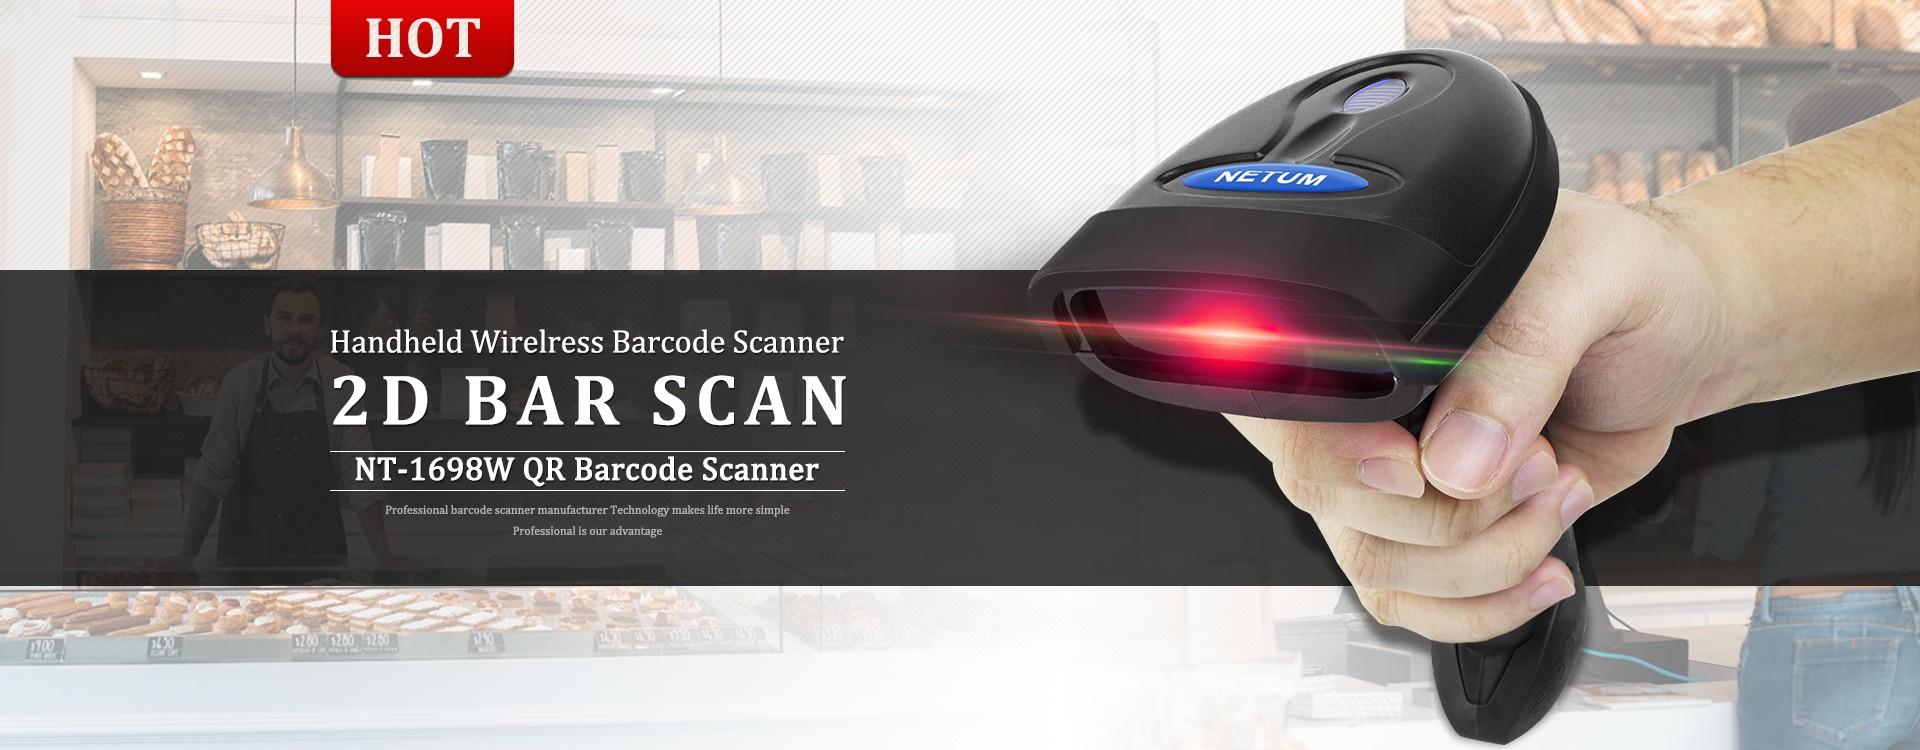 1D Laser Wired Barcode Scanner